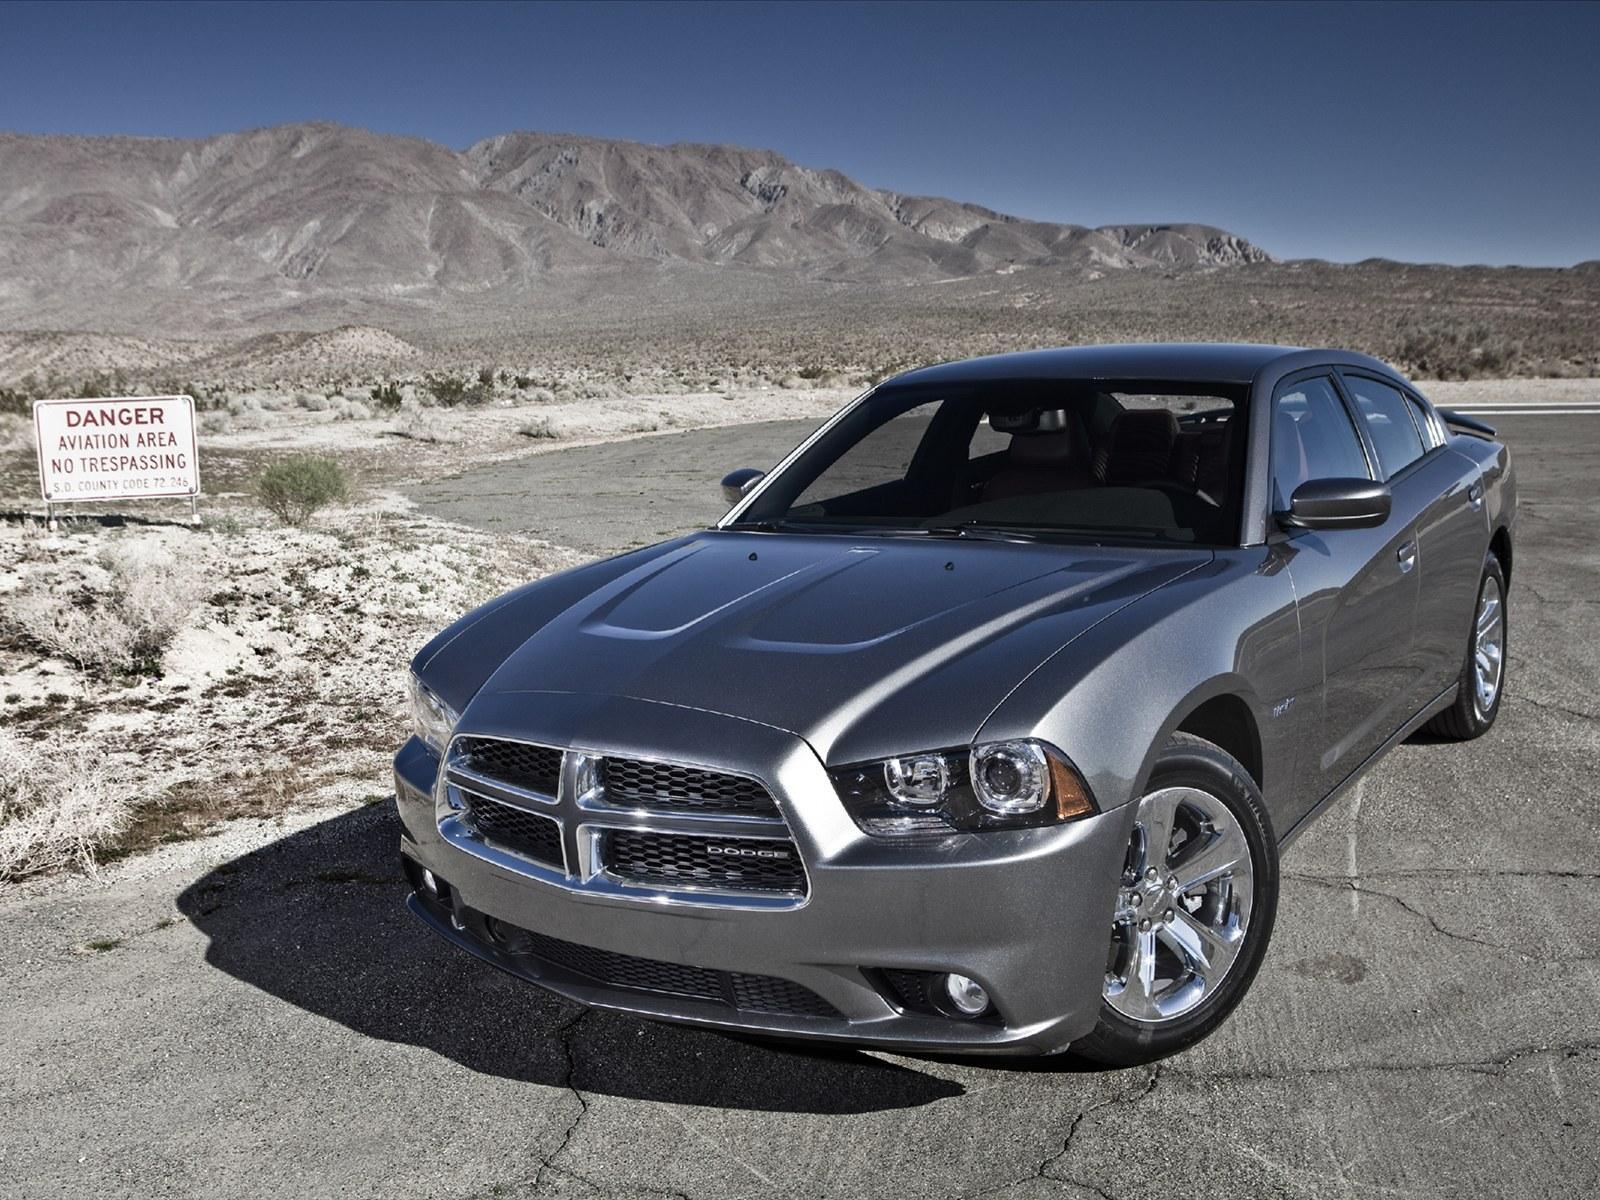 http://2.bp.blogspot.com/-6i35Am2mXRU/TdAsKFp0FrI/AAAAAAAACzA/wSZTHKfA0KM/s1600/Dodge+Charger+RT+AWD+2012+pictures.jpg